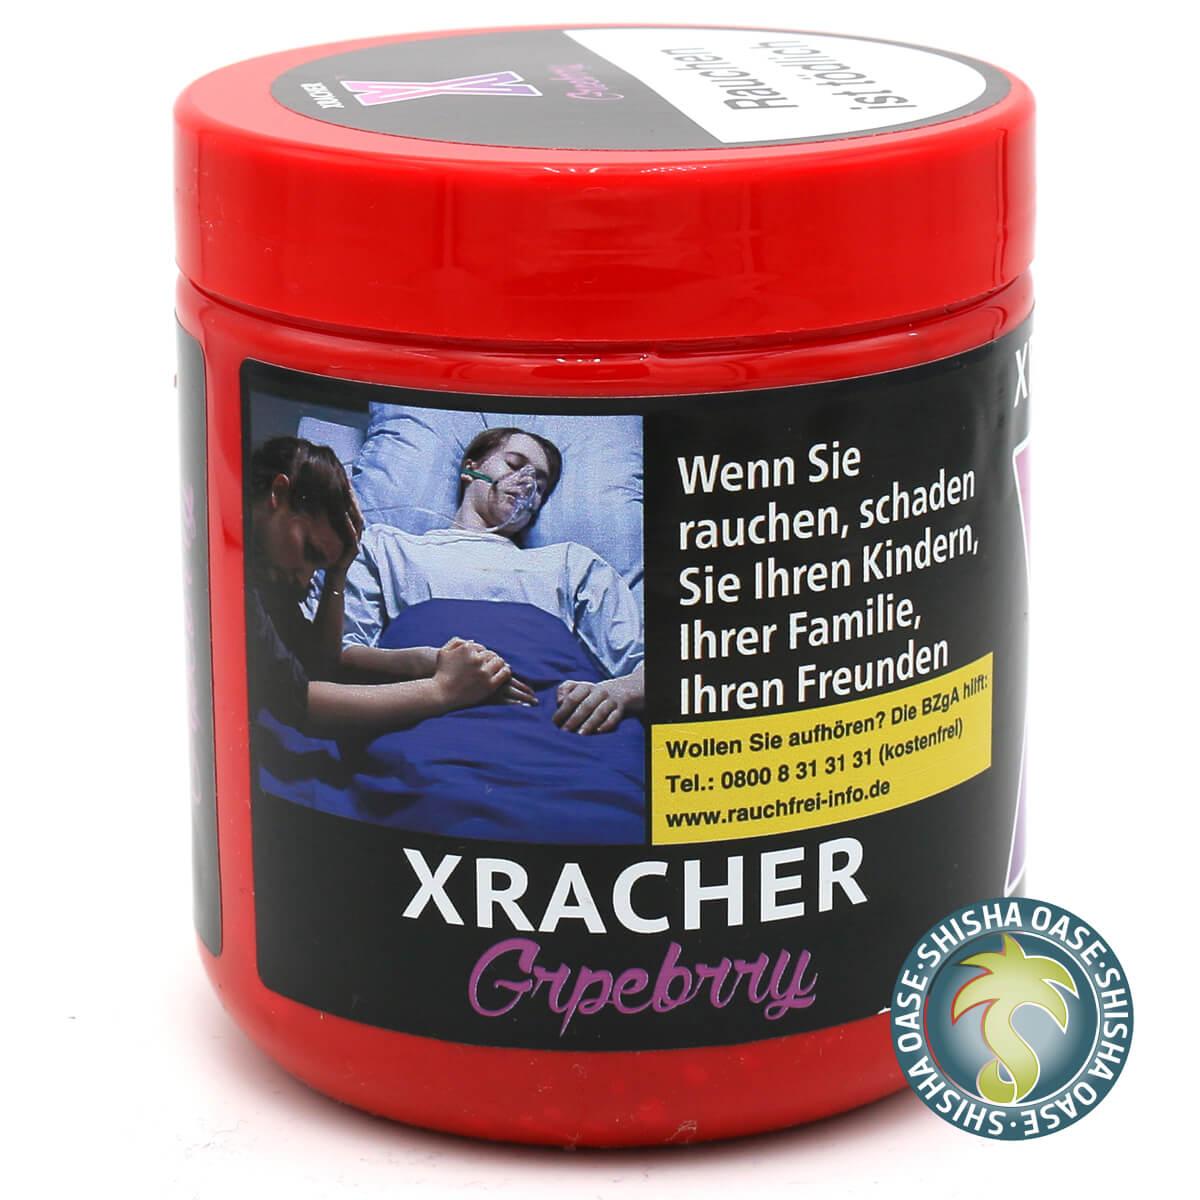 XRacher Tobacco - Grpebrry 200g